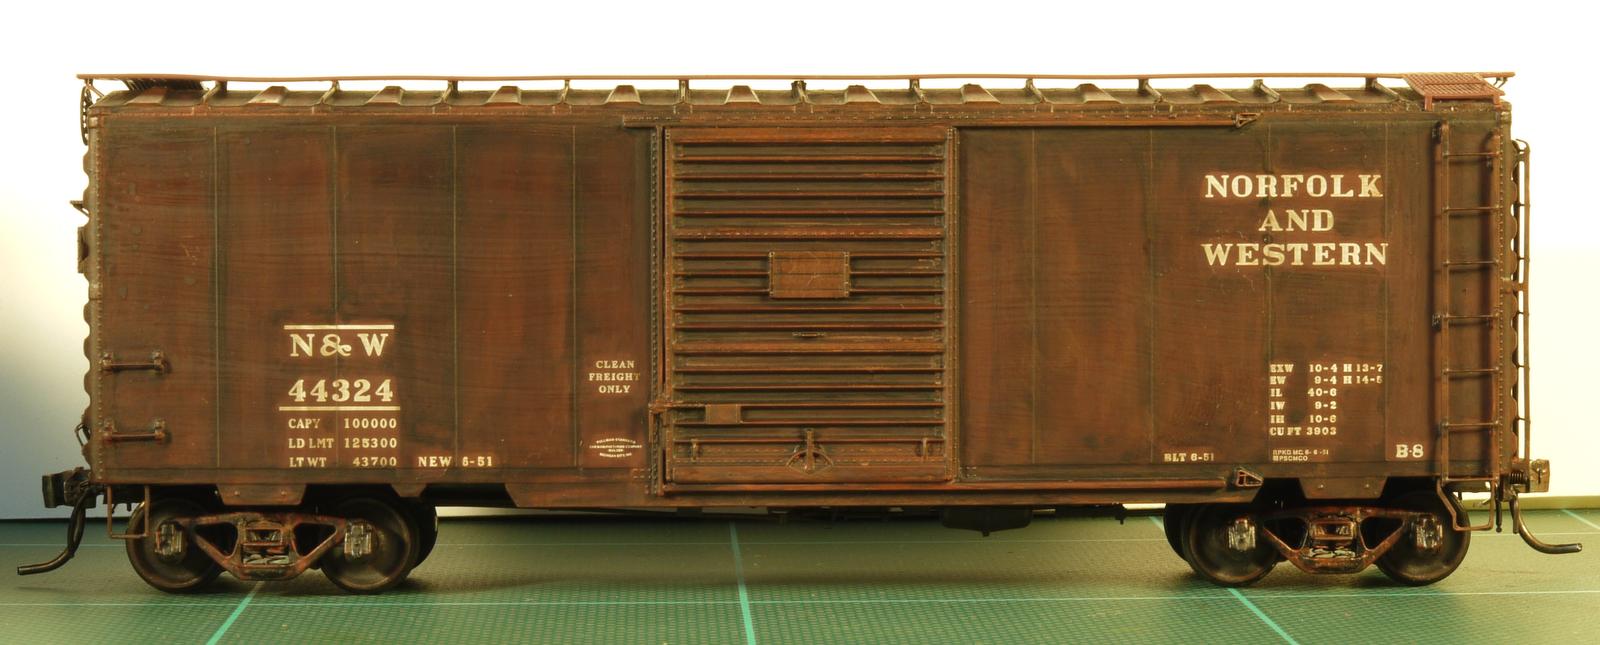 N&W+44324+box+car+12b.png